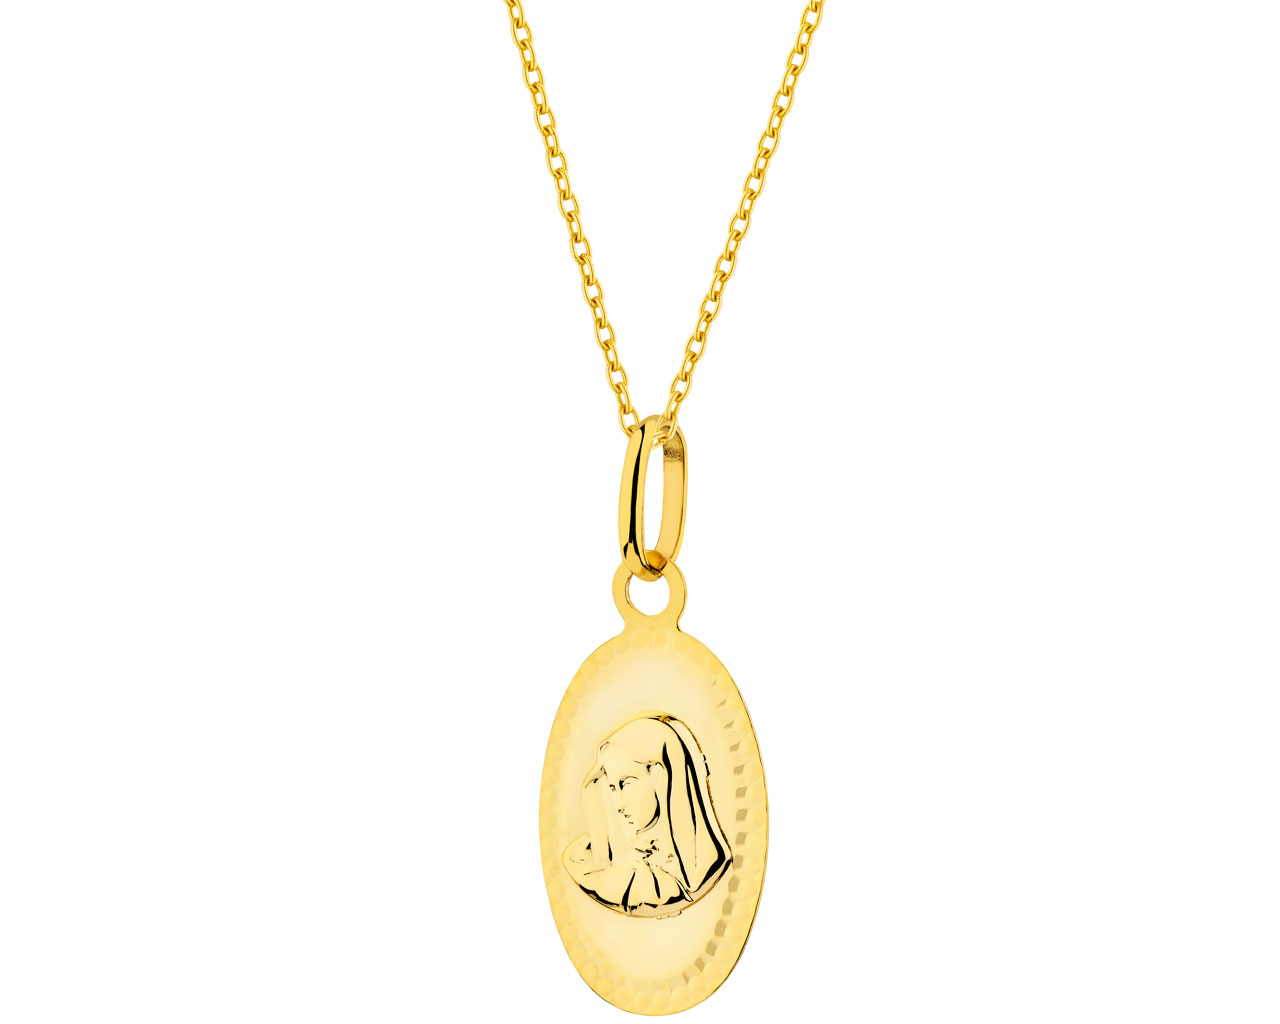 Altar\u2019d State \u2018Grace\u2019 Gold Engraved Pendant Beaded Expandable Bracelet